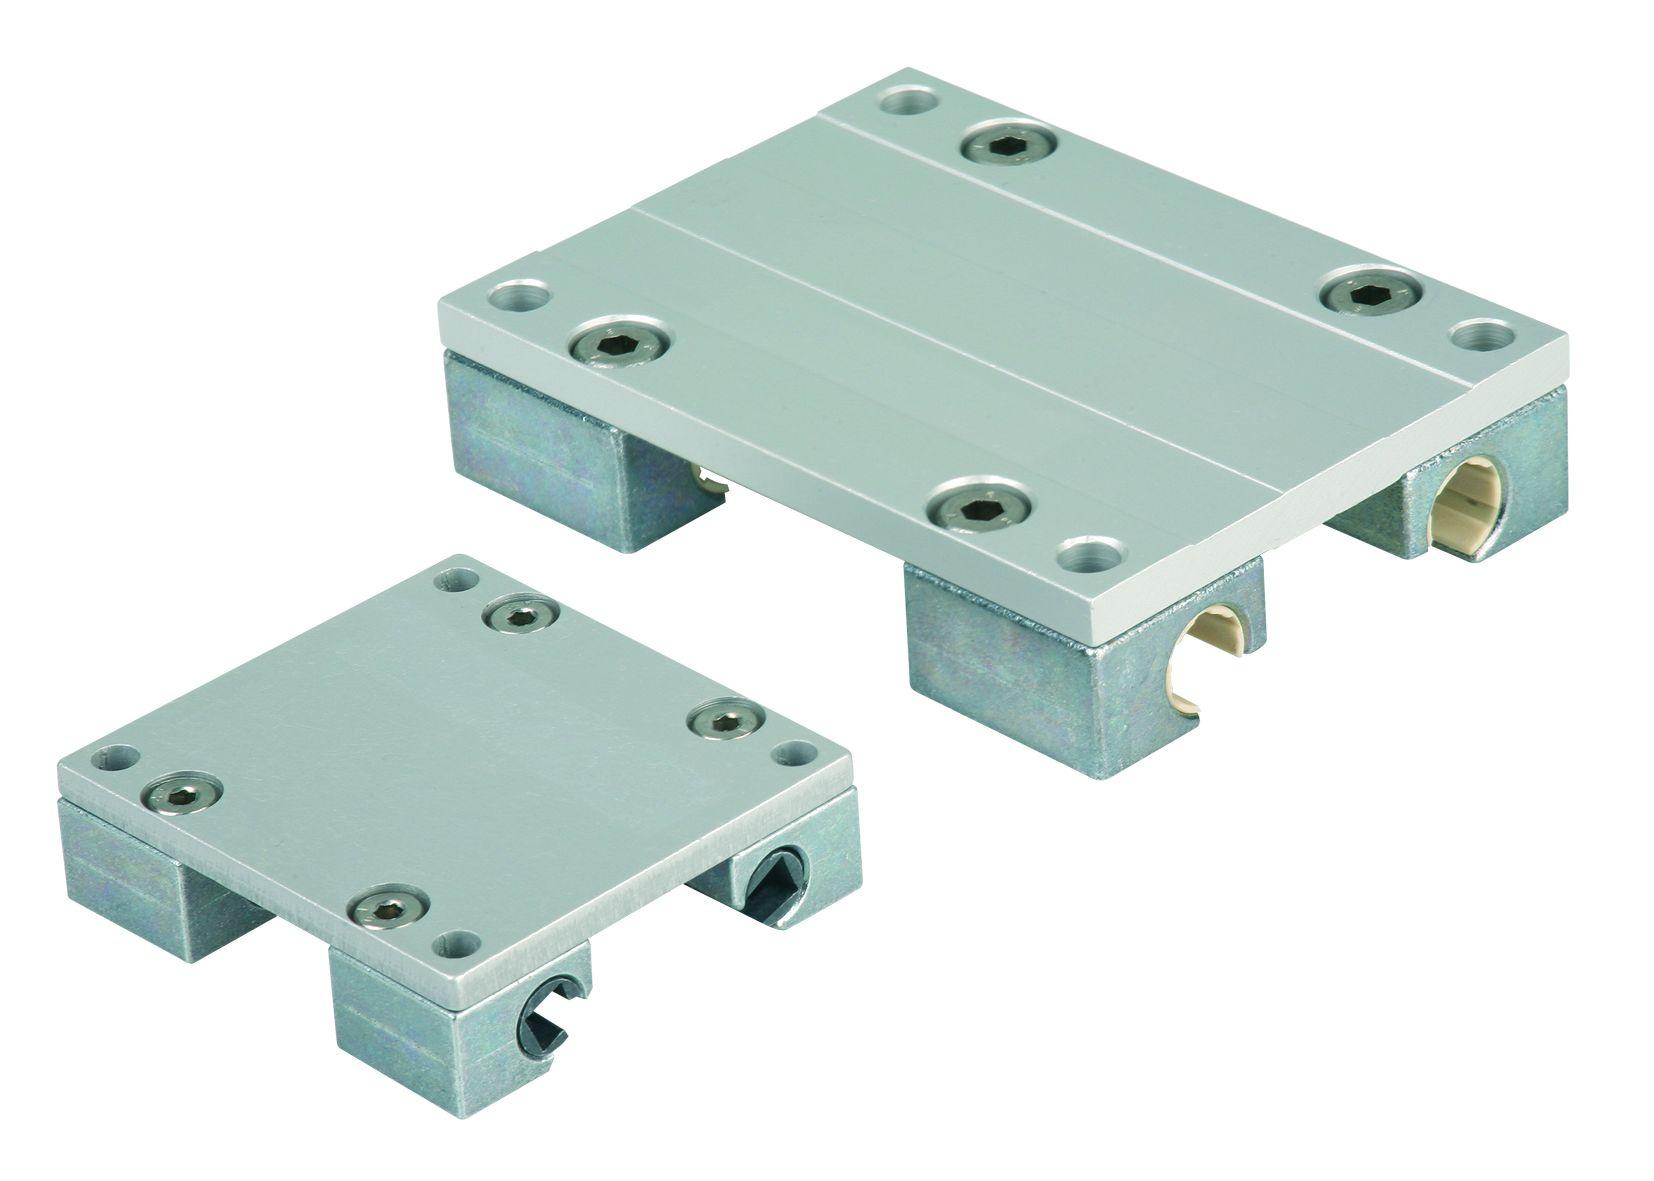 Material: Carriage die-cast zinc. Mounting plate aluminium. Bearing material iglidur® J. Version: Ca...